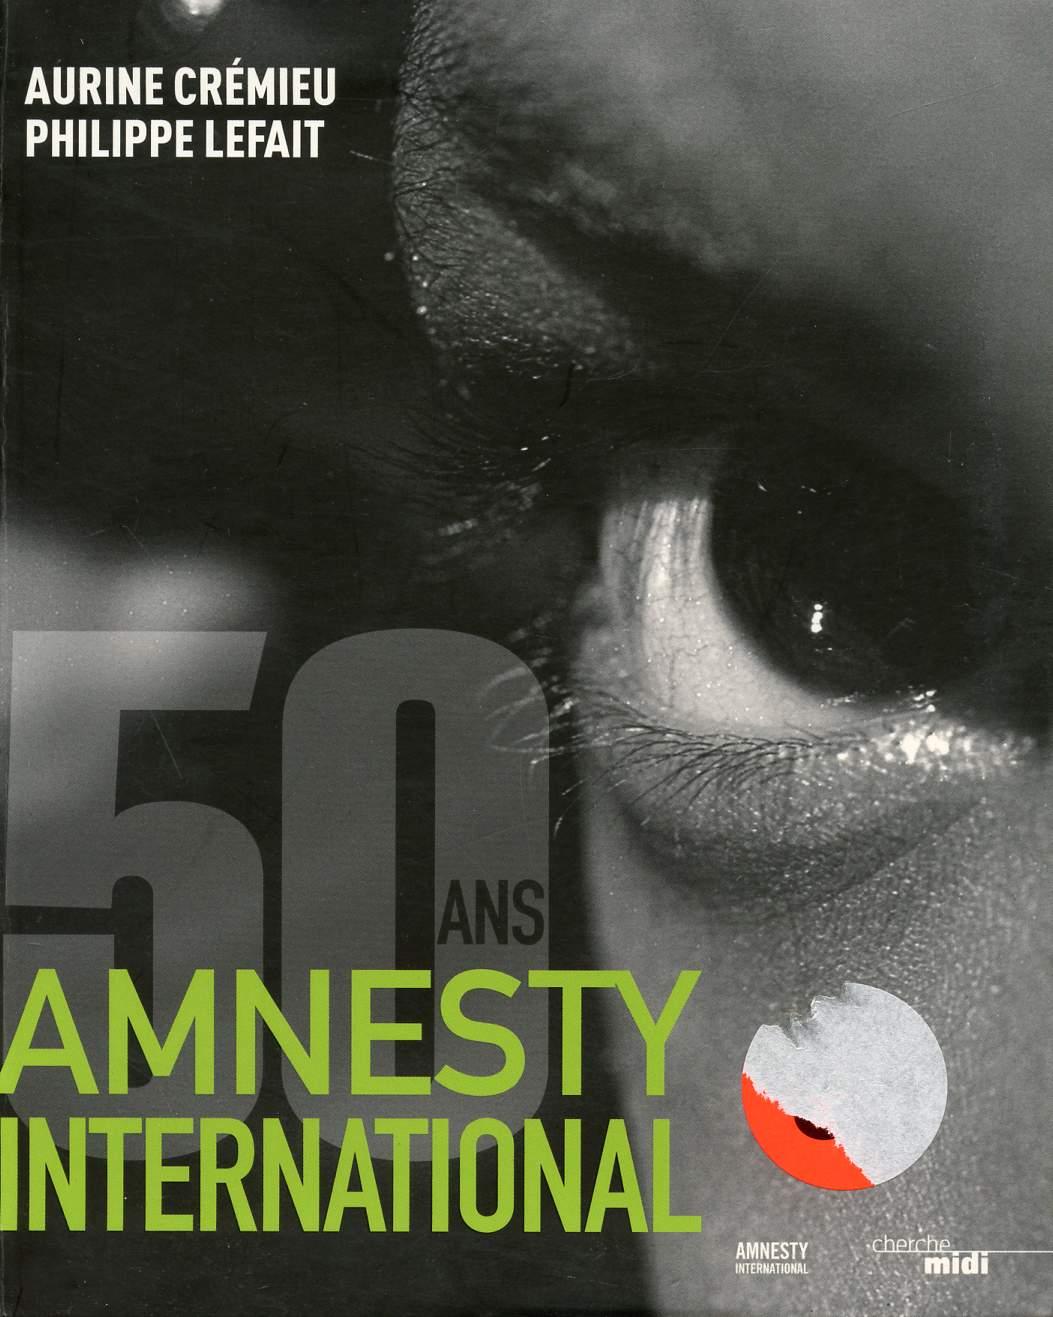 50 ANS AMESTY INTERNATIONAL